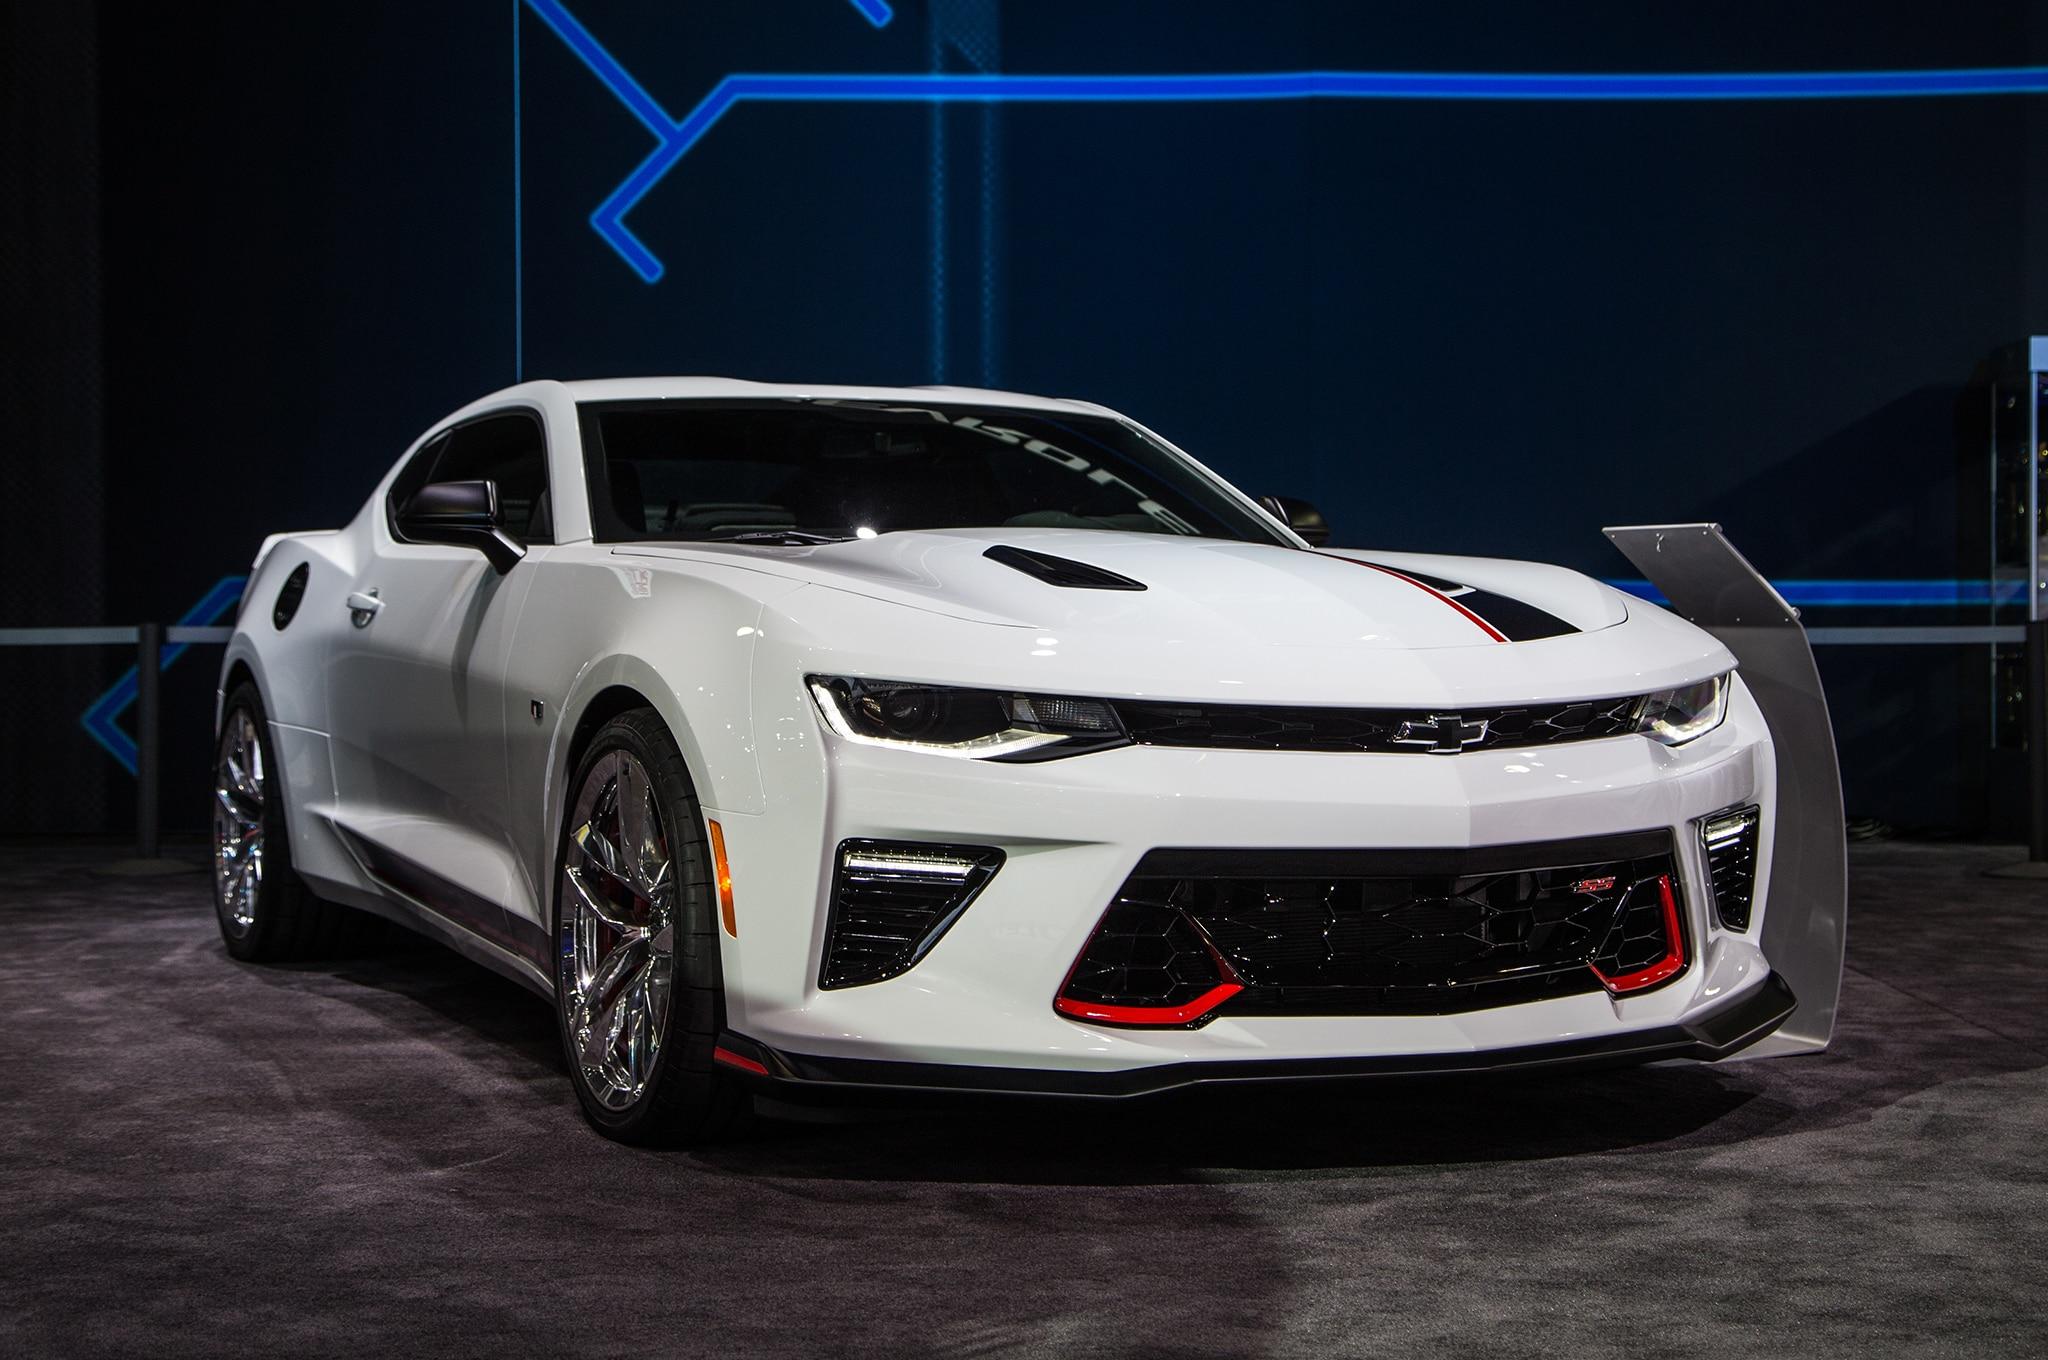 132 - Chevrolet Performance Camaro V 6 And V 8 Concepts